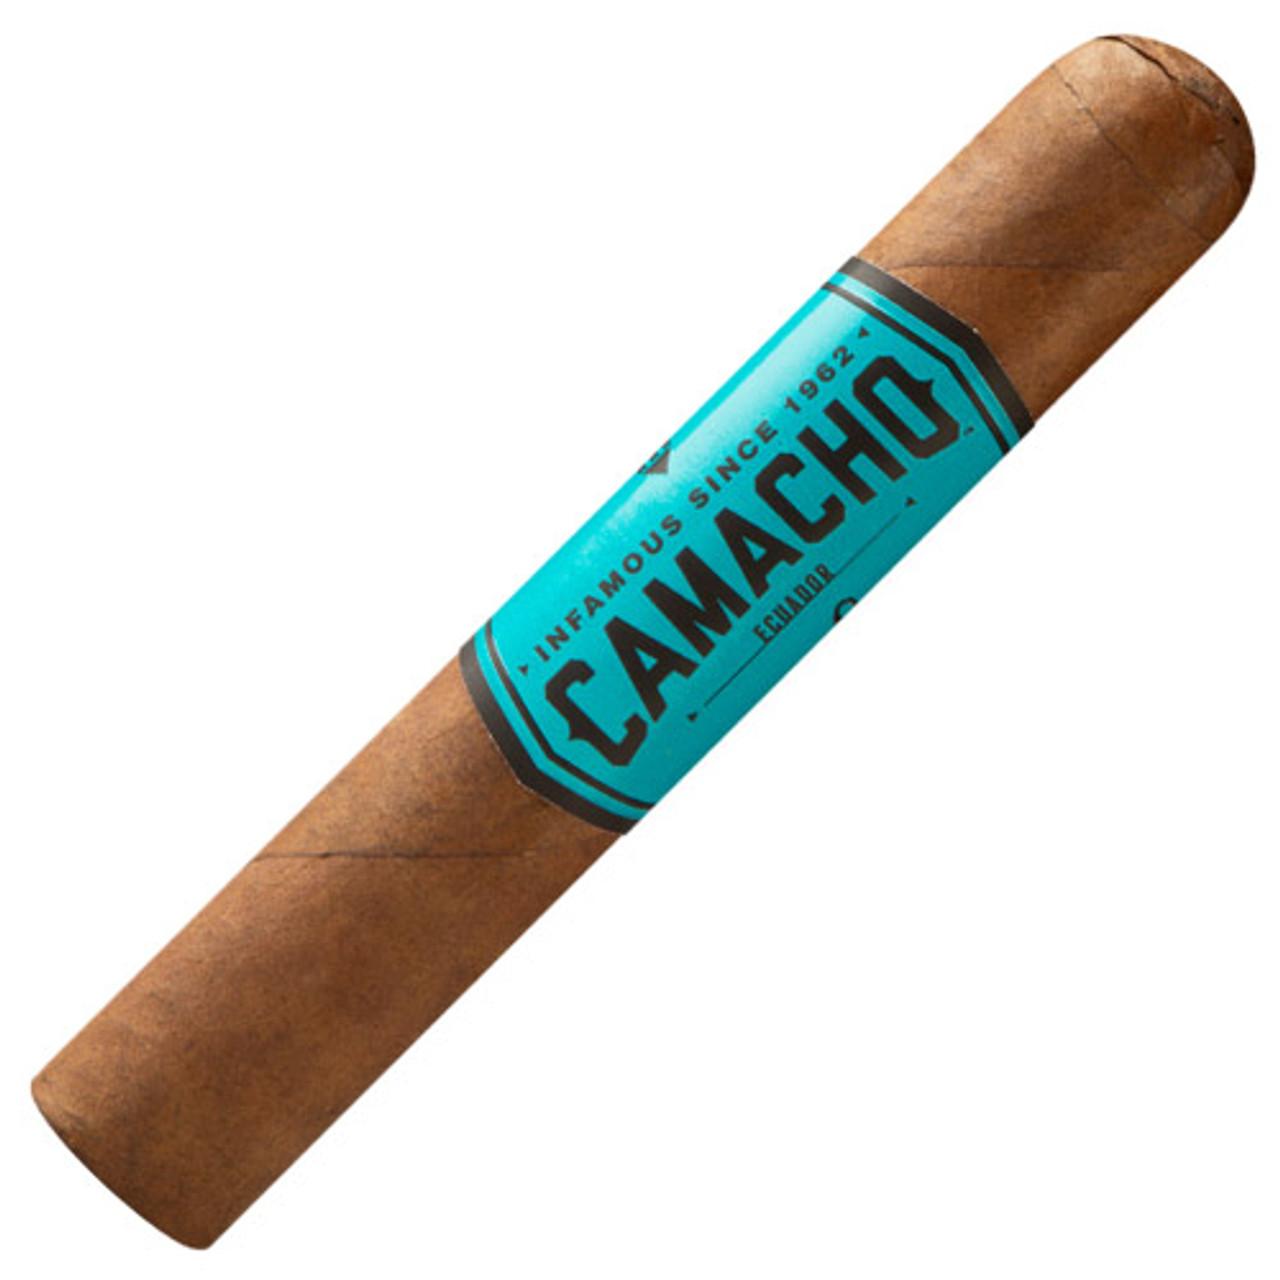 Camacho Ecuador Robusto Cigars - 5 x 50 (Box of 20)